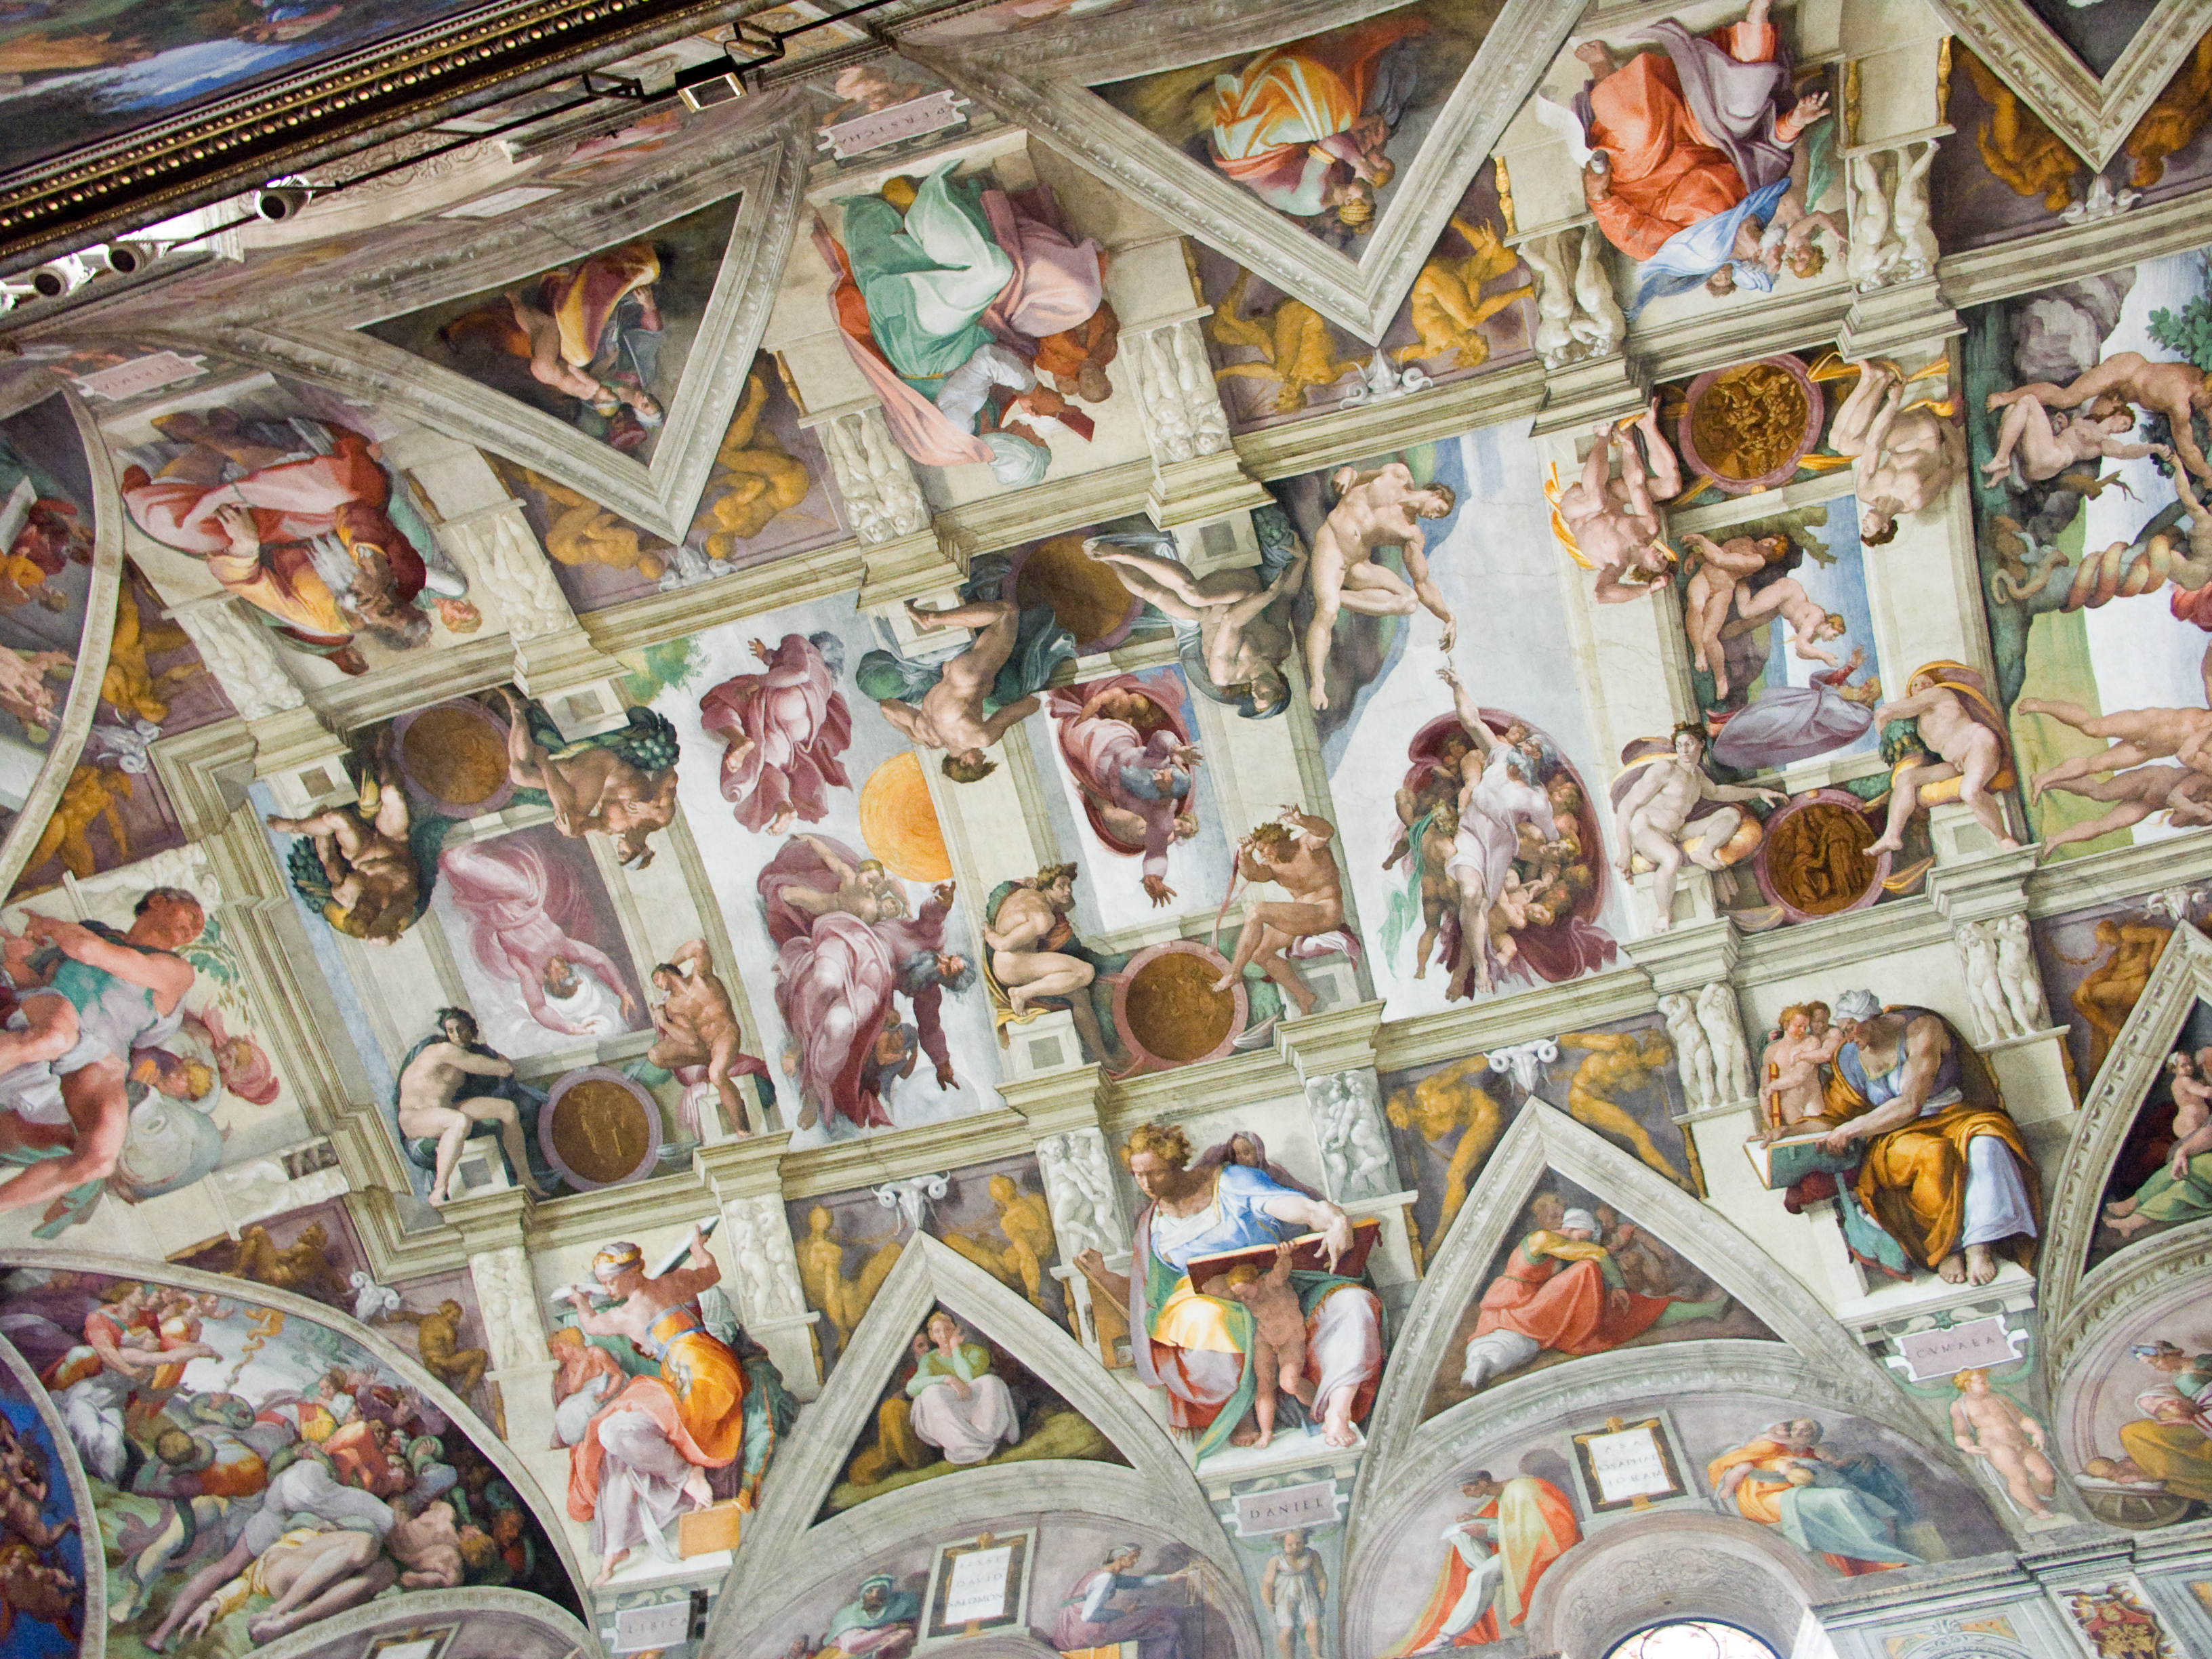 http://upload.wikimedia.org/wikipedia/commons/1/12/Vatican-ChapelleSixtine-Plafond.jpg